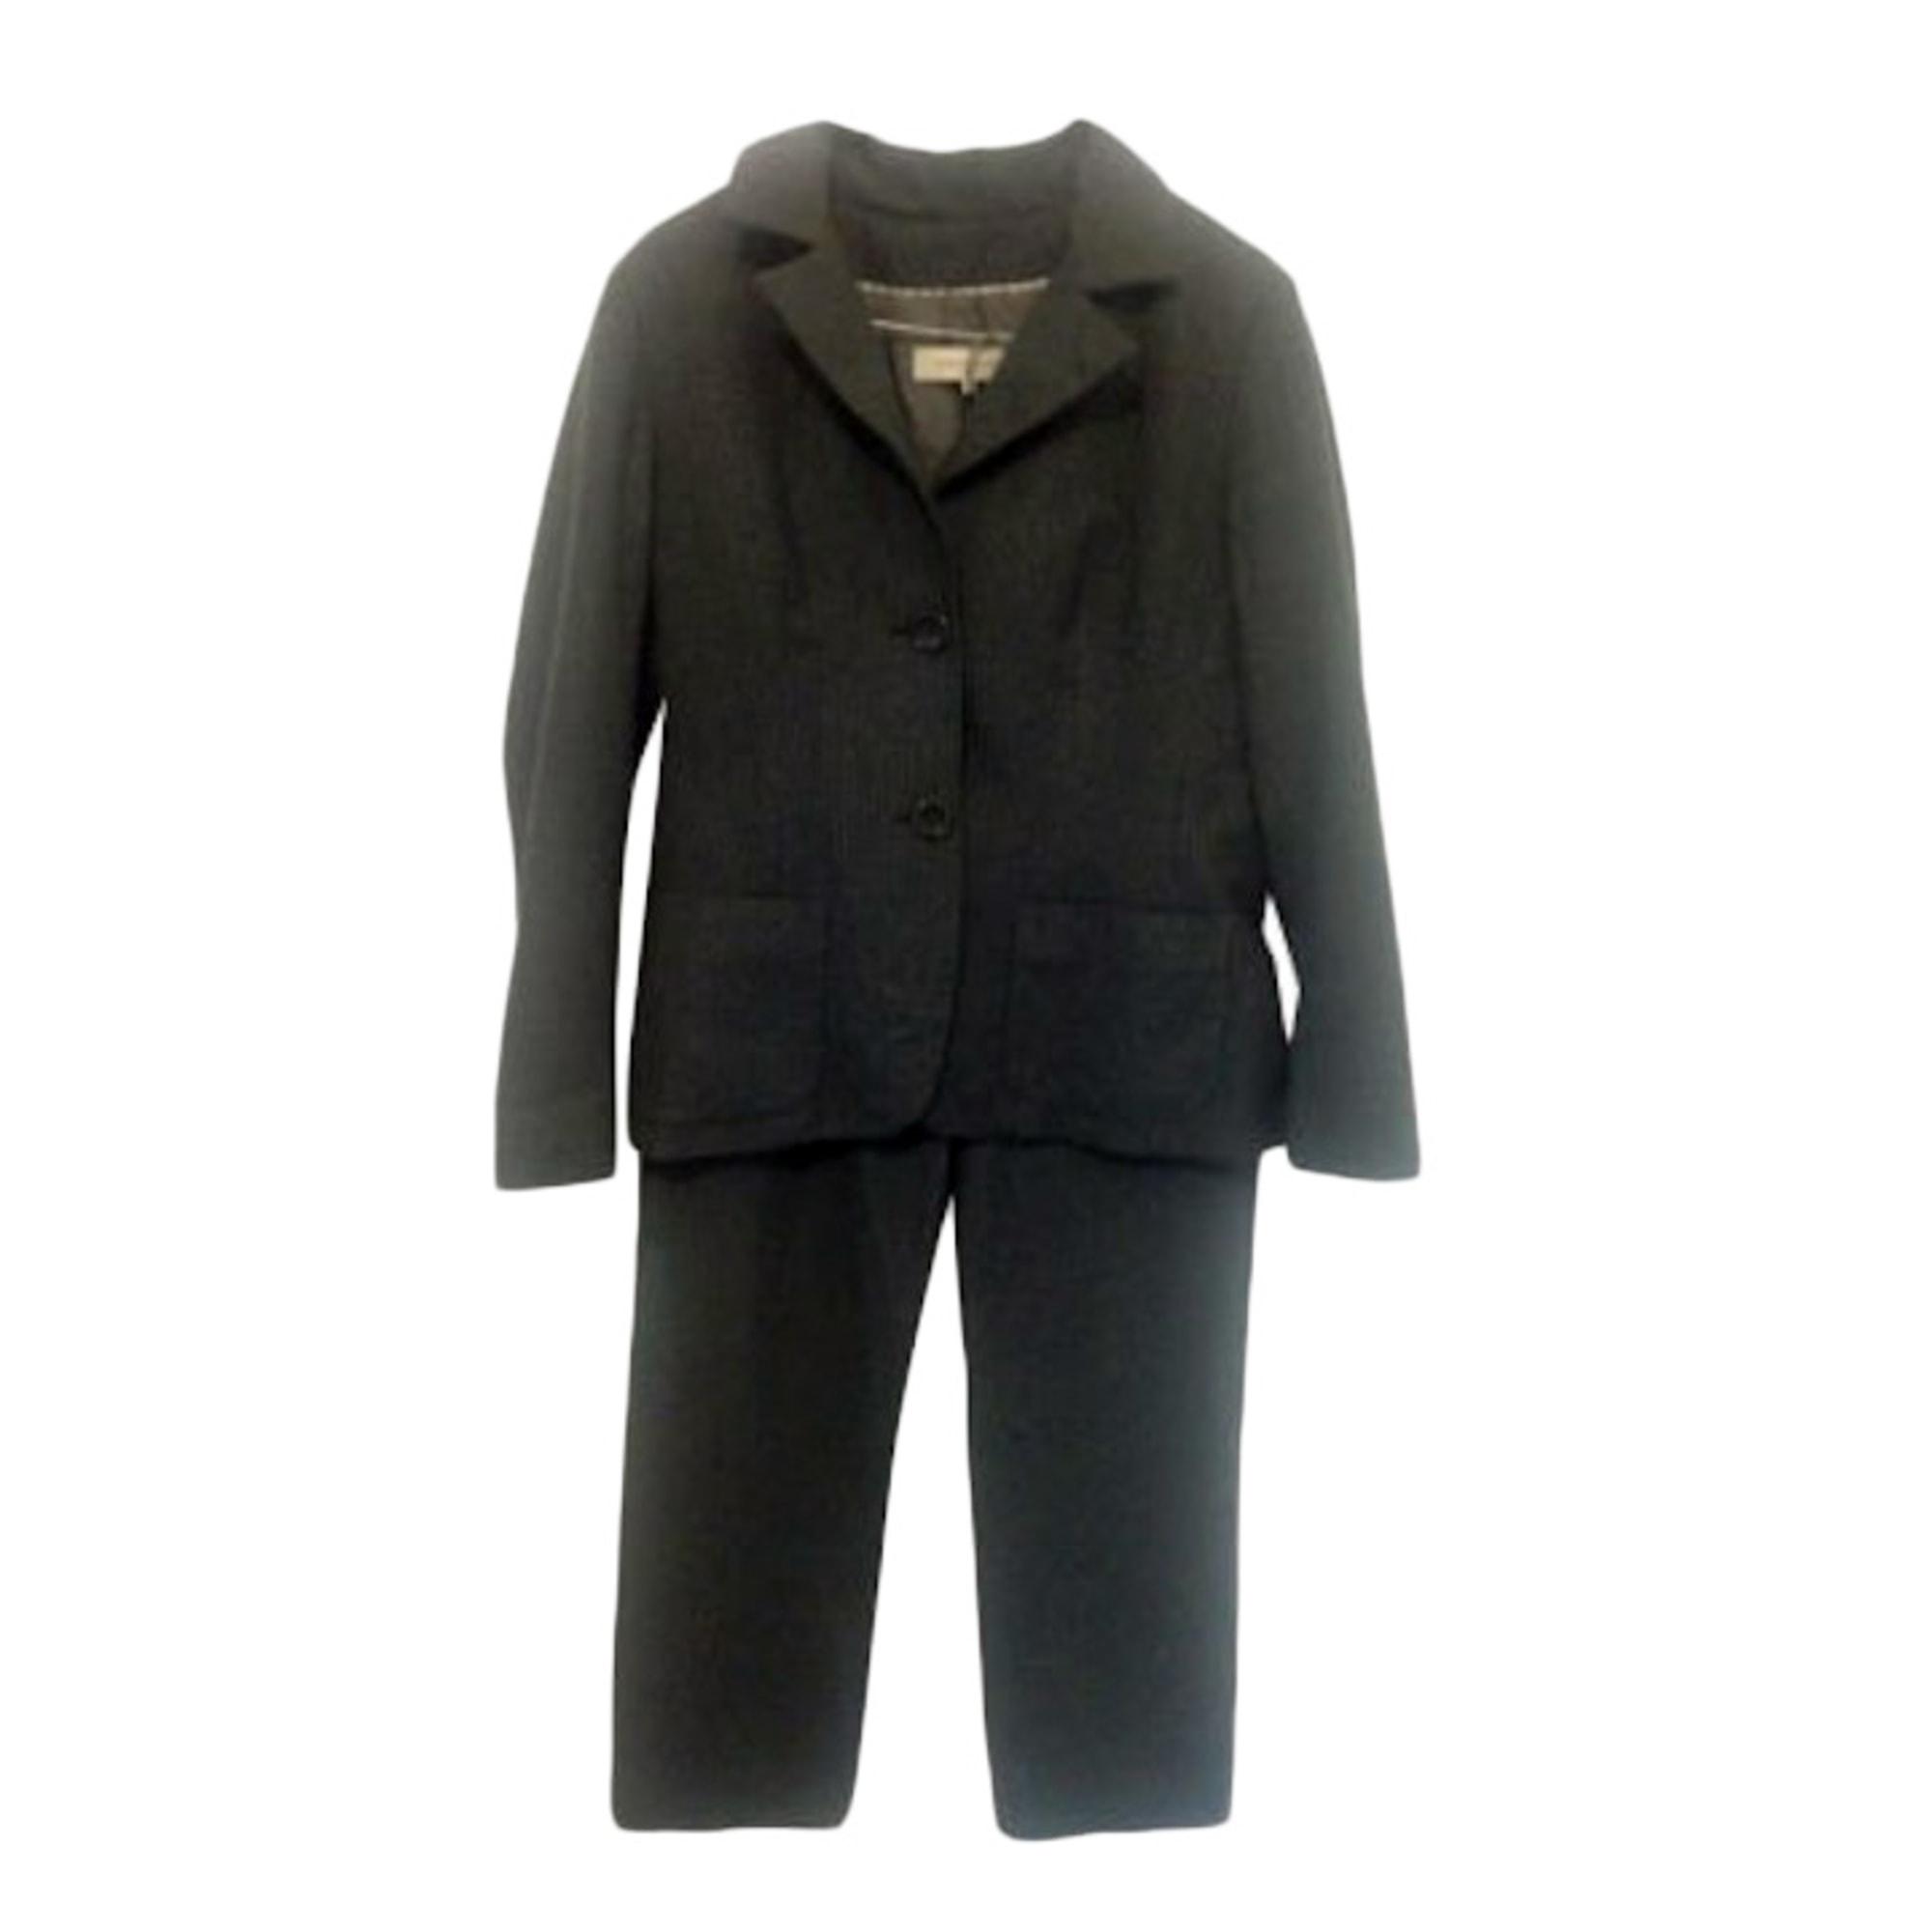 Tailleur pantalon GERARD DAREL Gris, anthracite